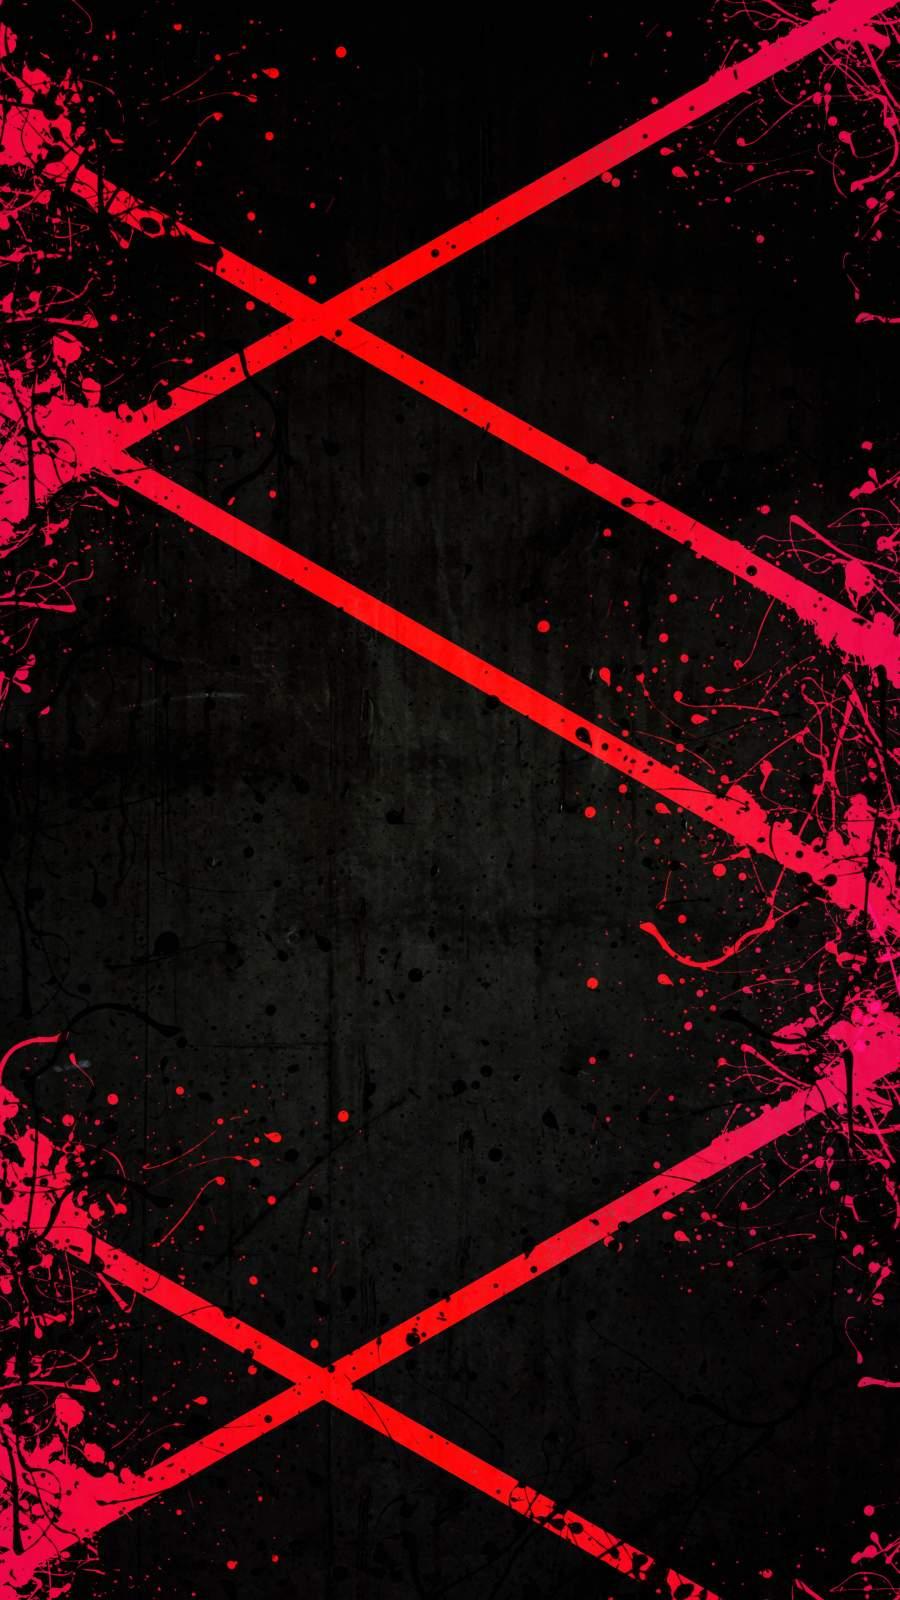 Red Splash iPhone Wallpaper